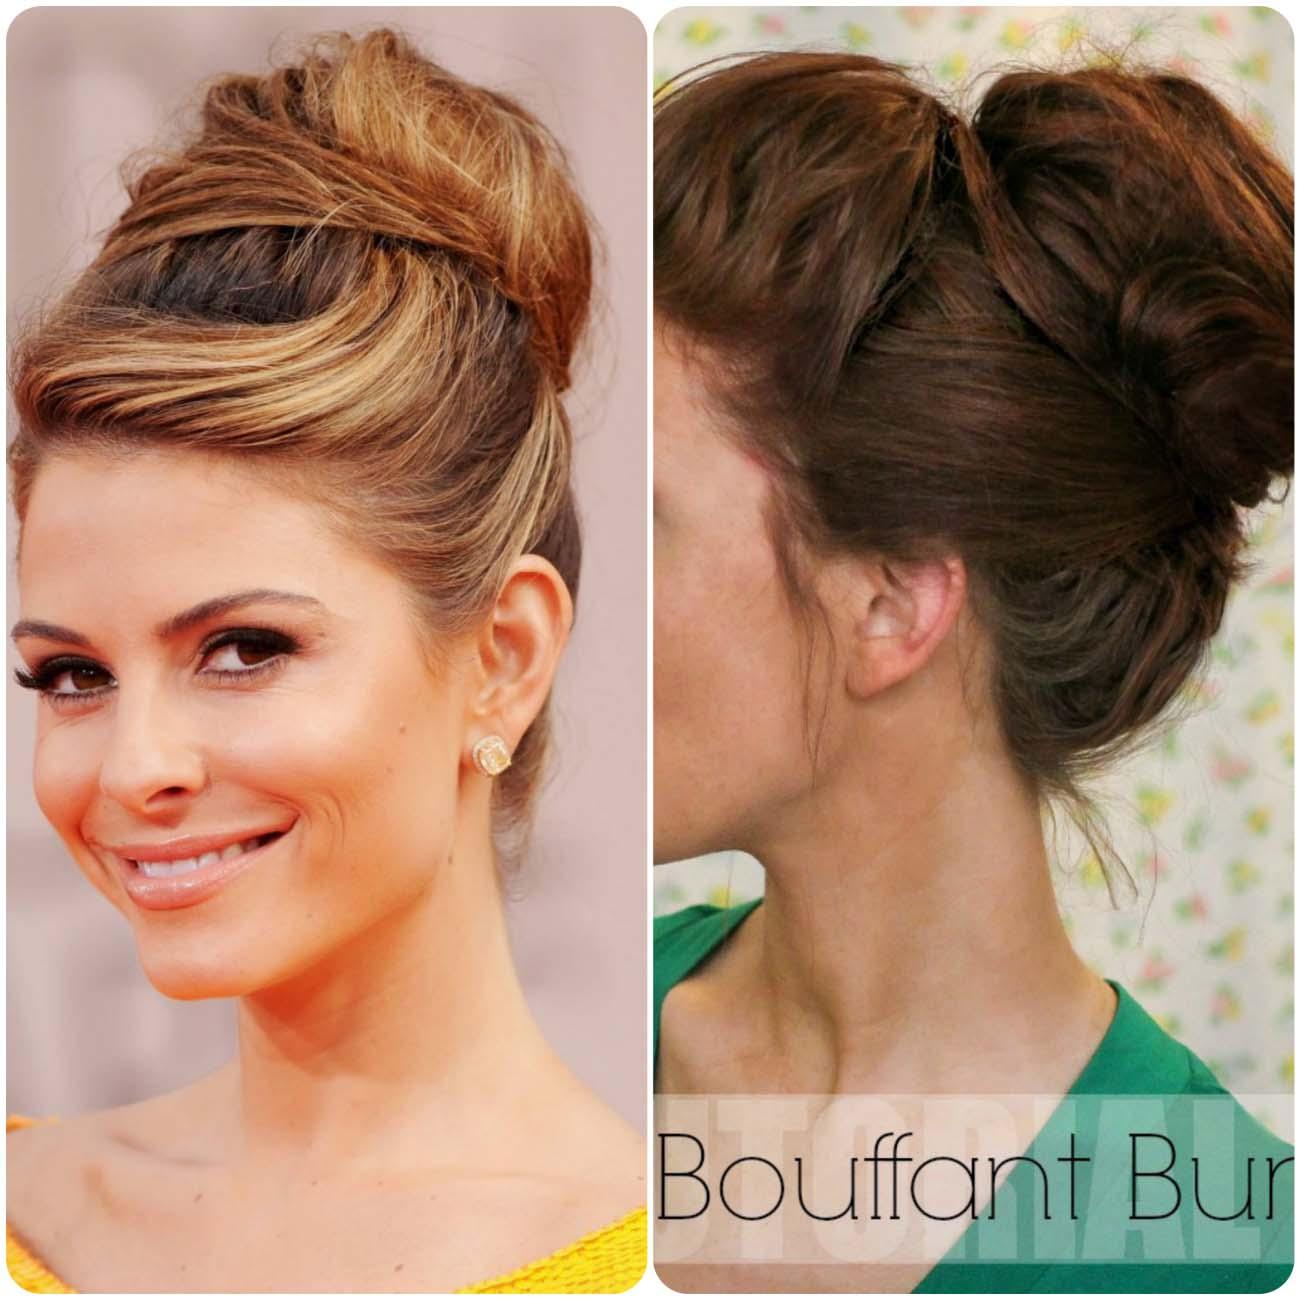 freckled_fox_hair_tutorial_the_bouffant_bun_summer_winter_fall_spring_long_hair_tutorial_pibcvn1_Fotor_Collage